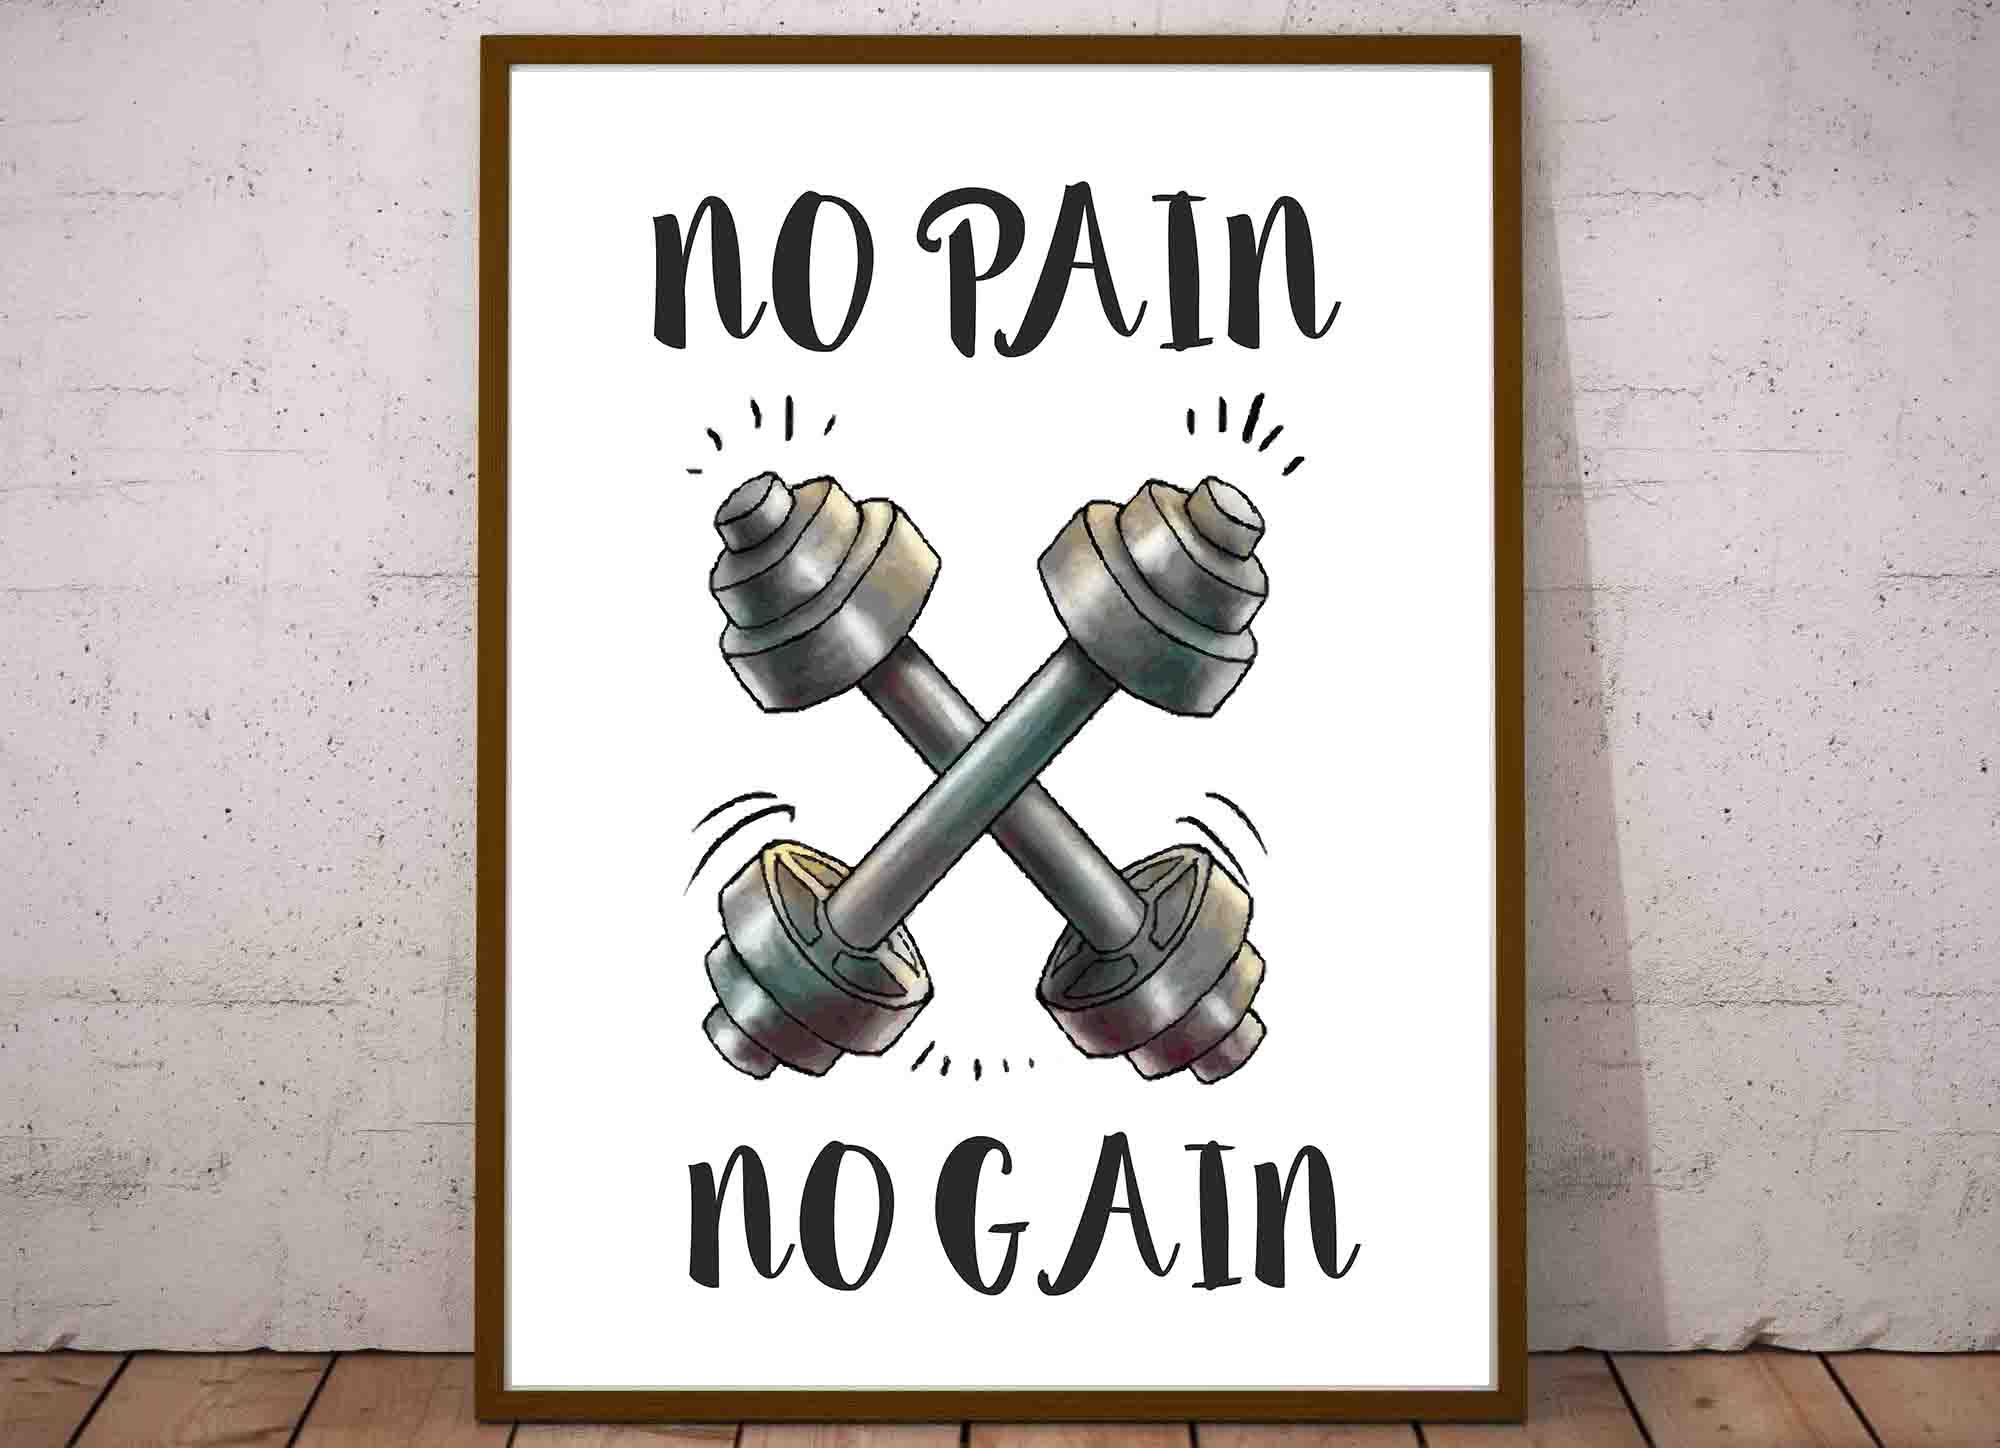 Plakaty Cytaty O Siłowni Po Angielsku No Pain No Gain Superplakatpl